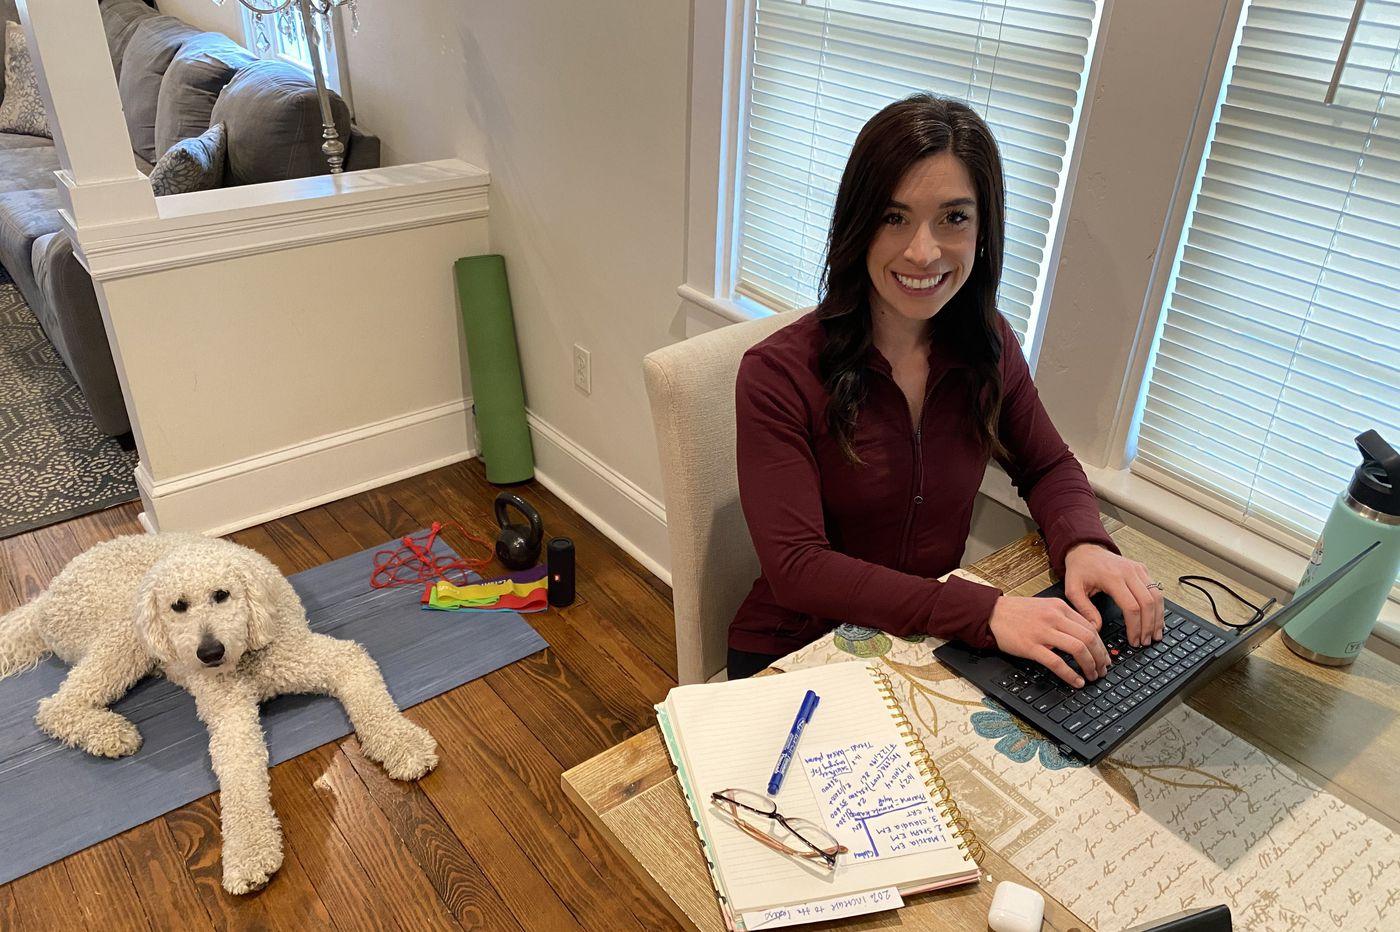 Kimberly Sargent DellaFranco and Thomas DellaFranco: Living, working, loving together